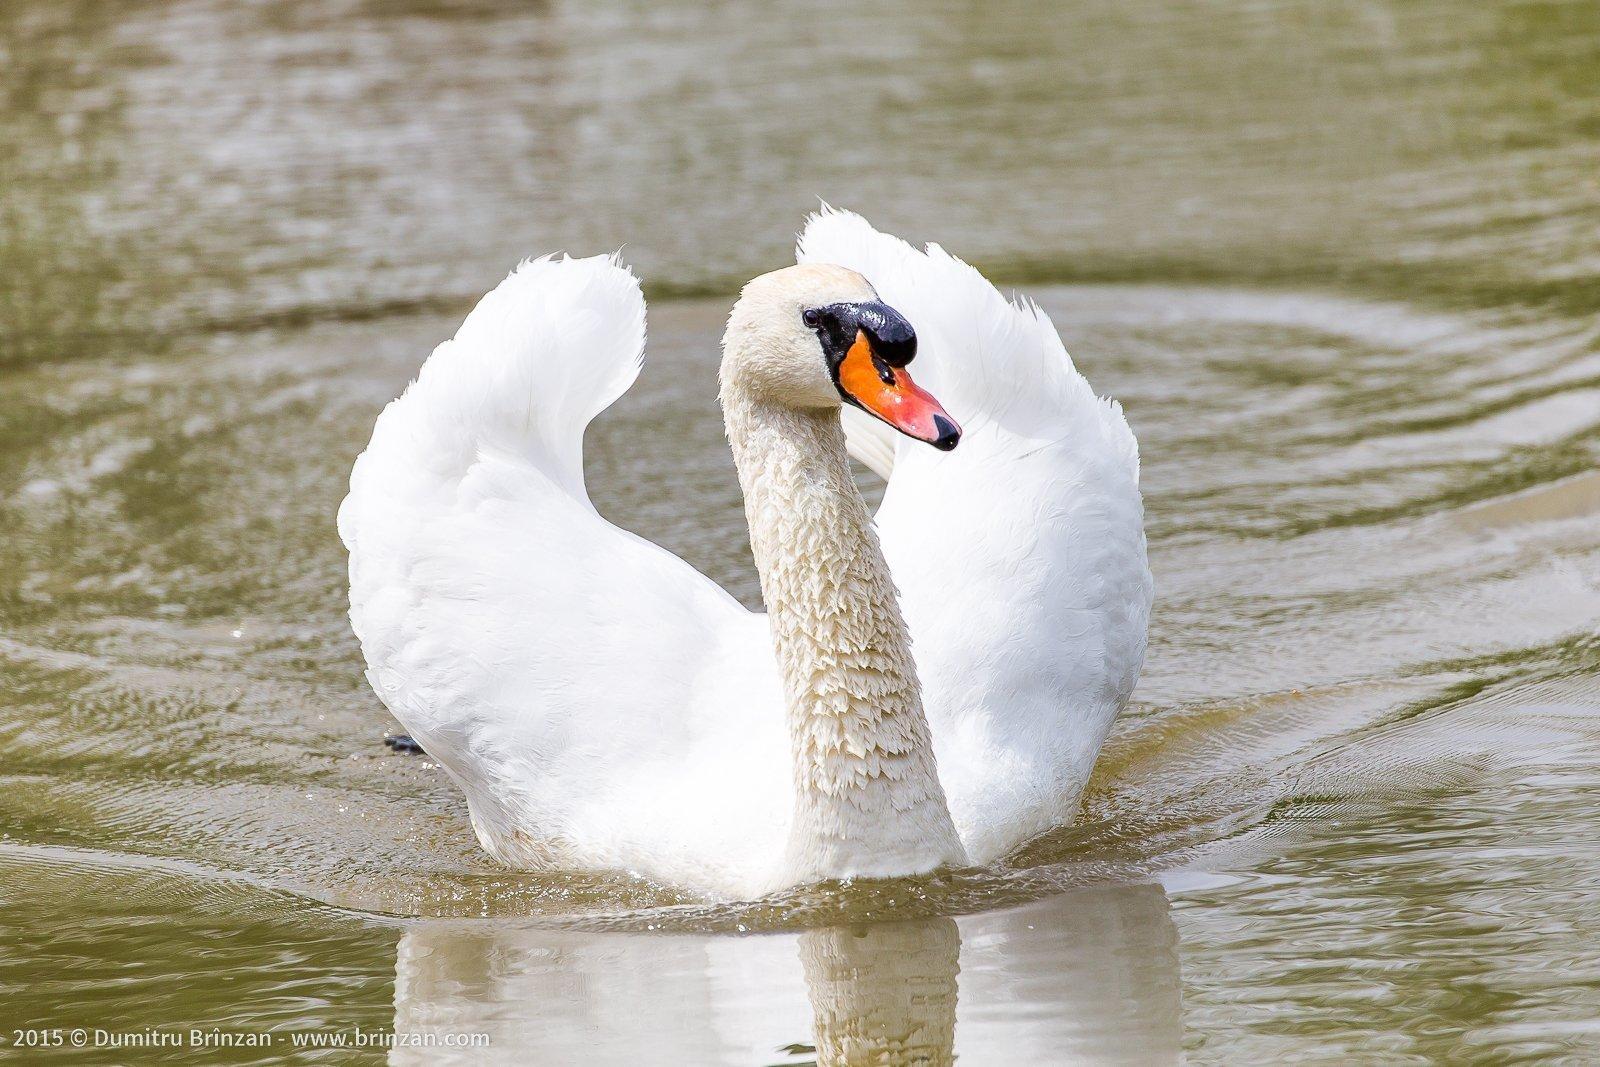 Purcari Estate - White Swan